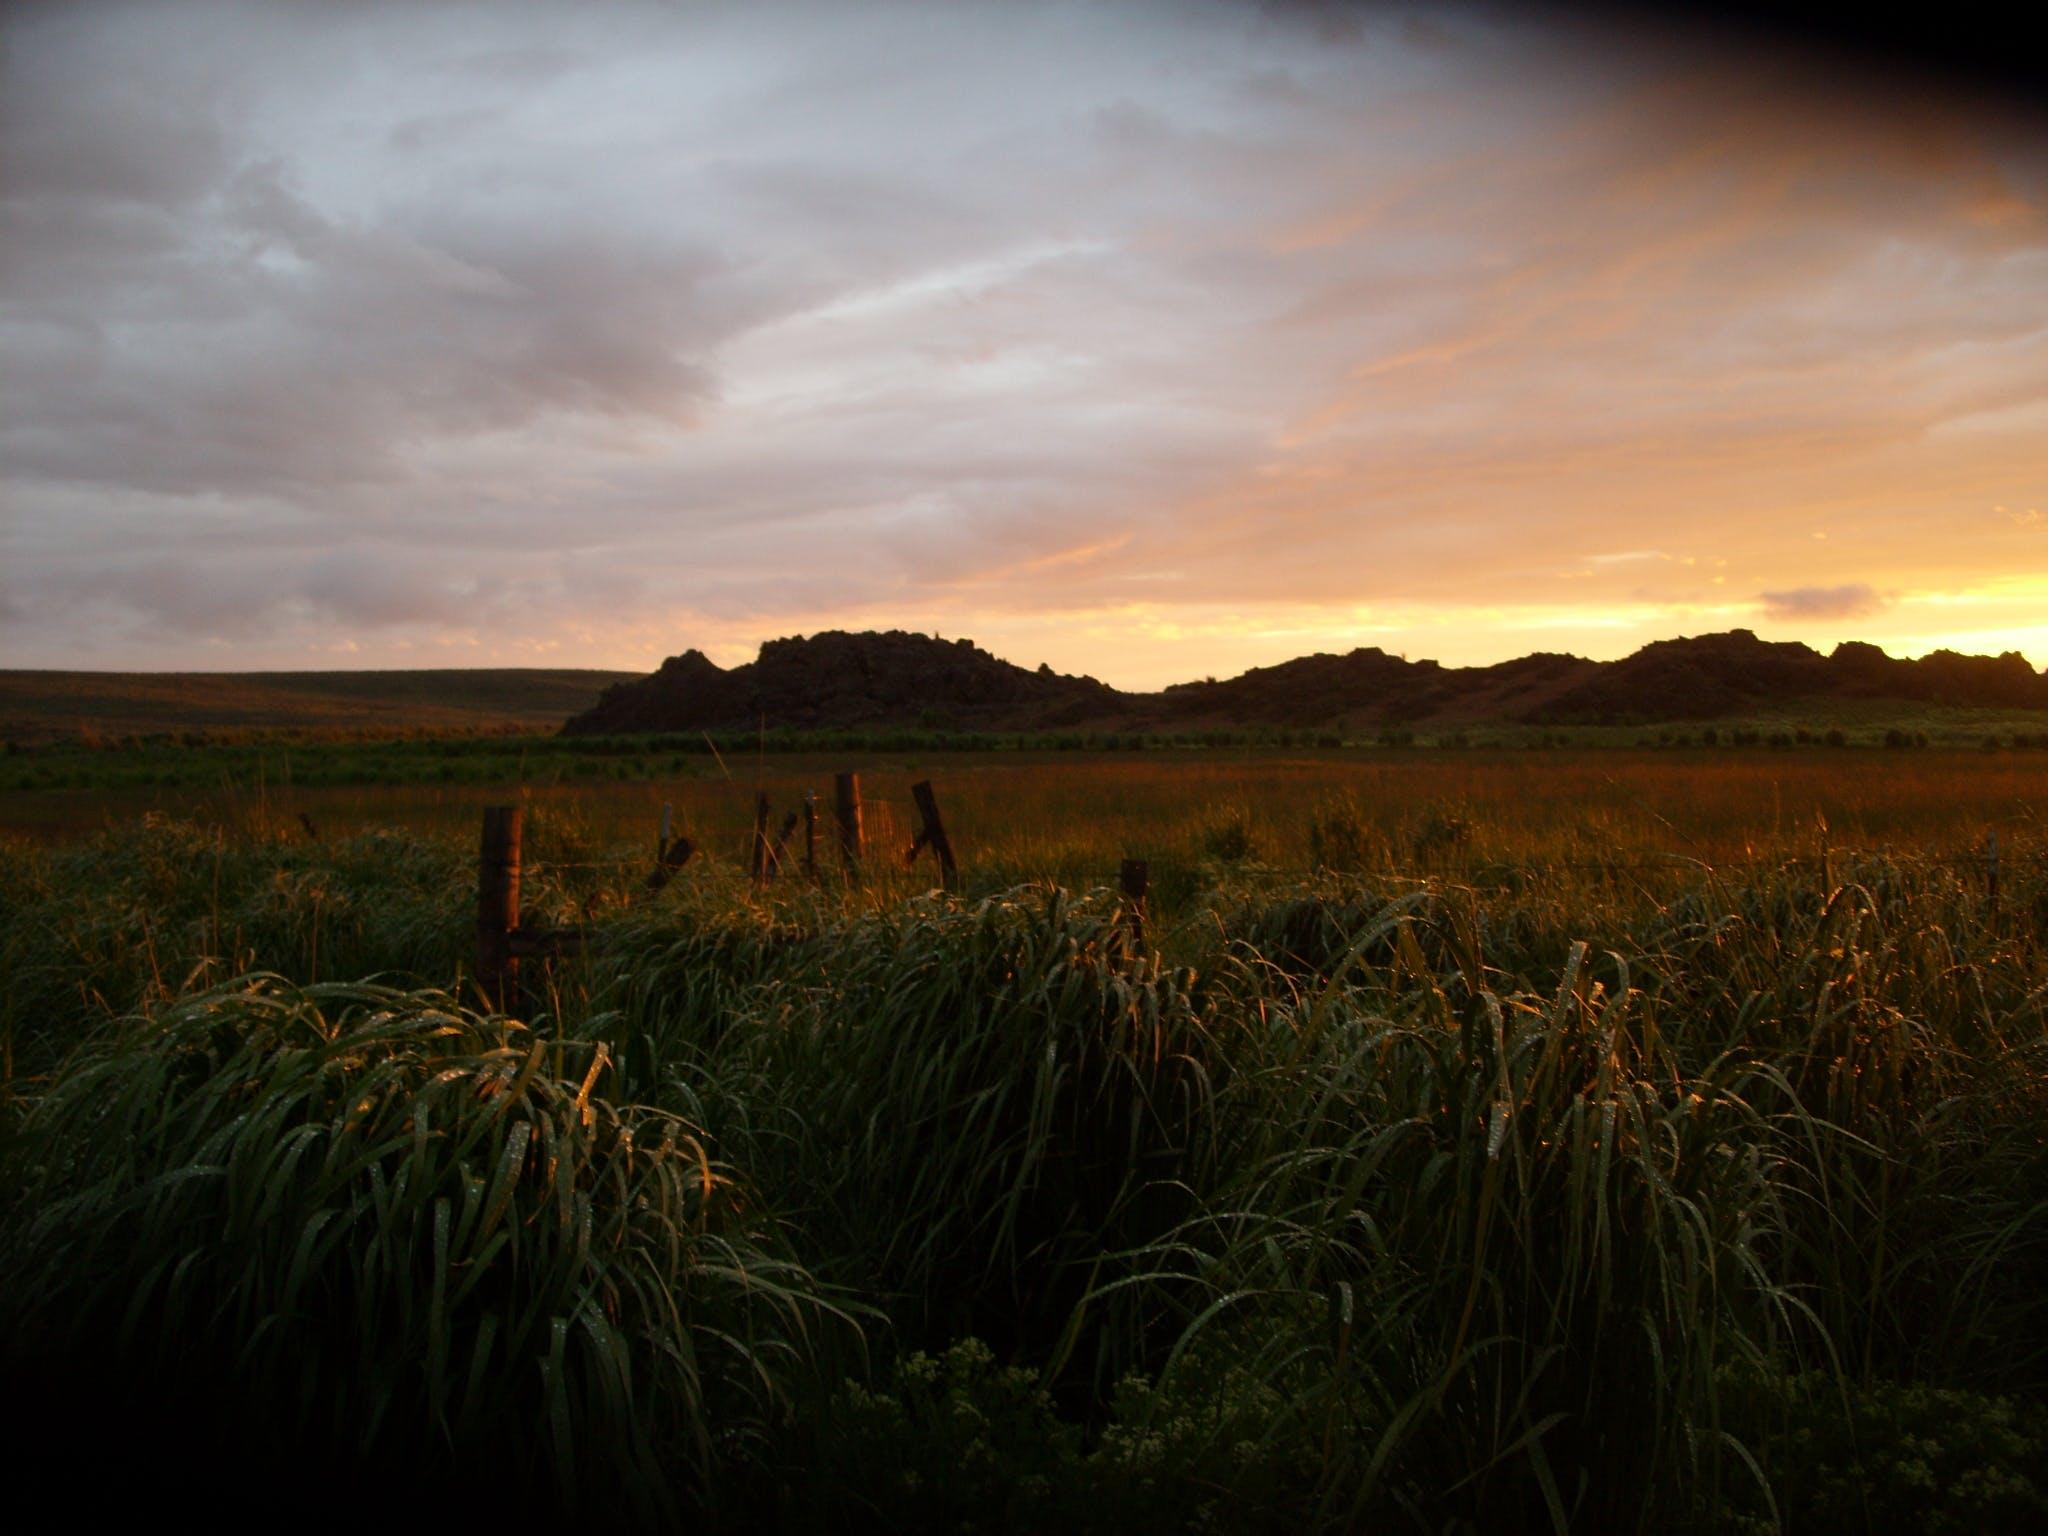 Free stock photo of Eastern Oregon, Joe Leineweber